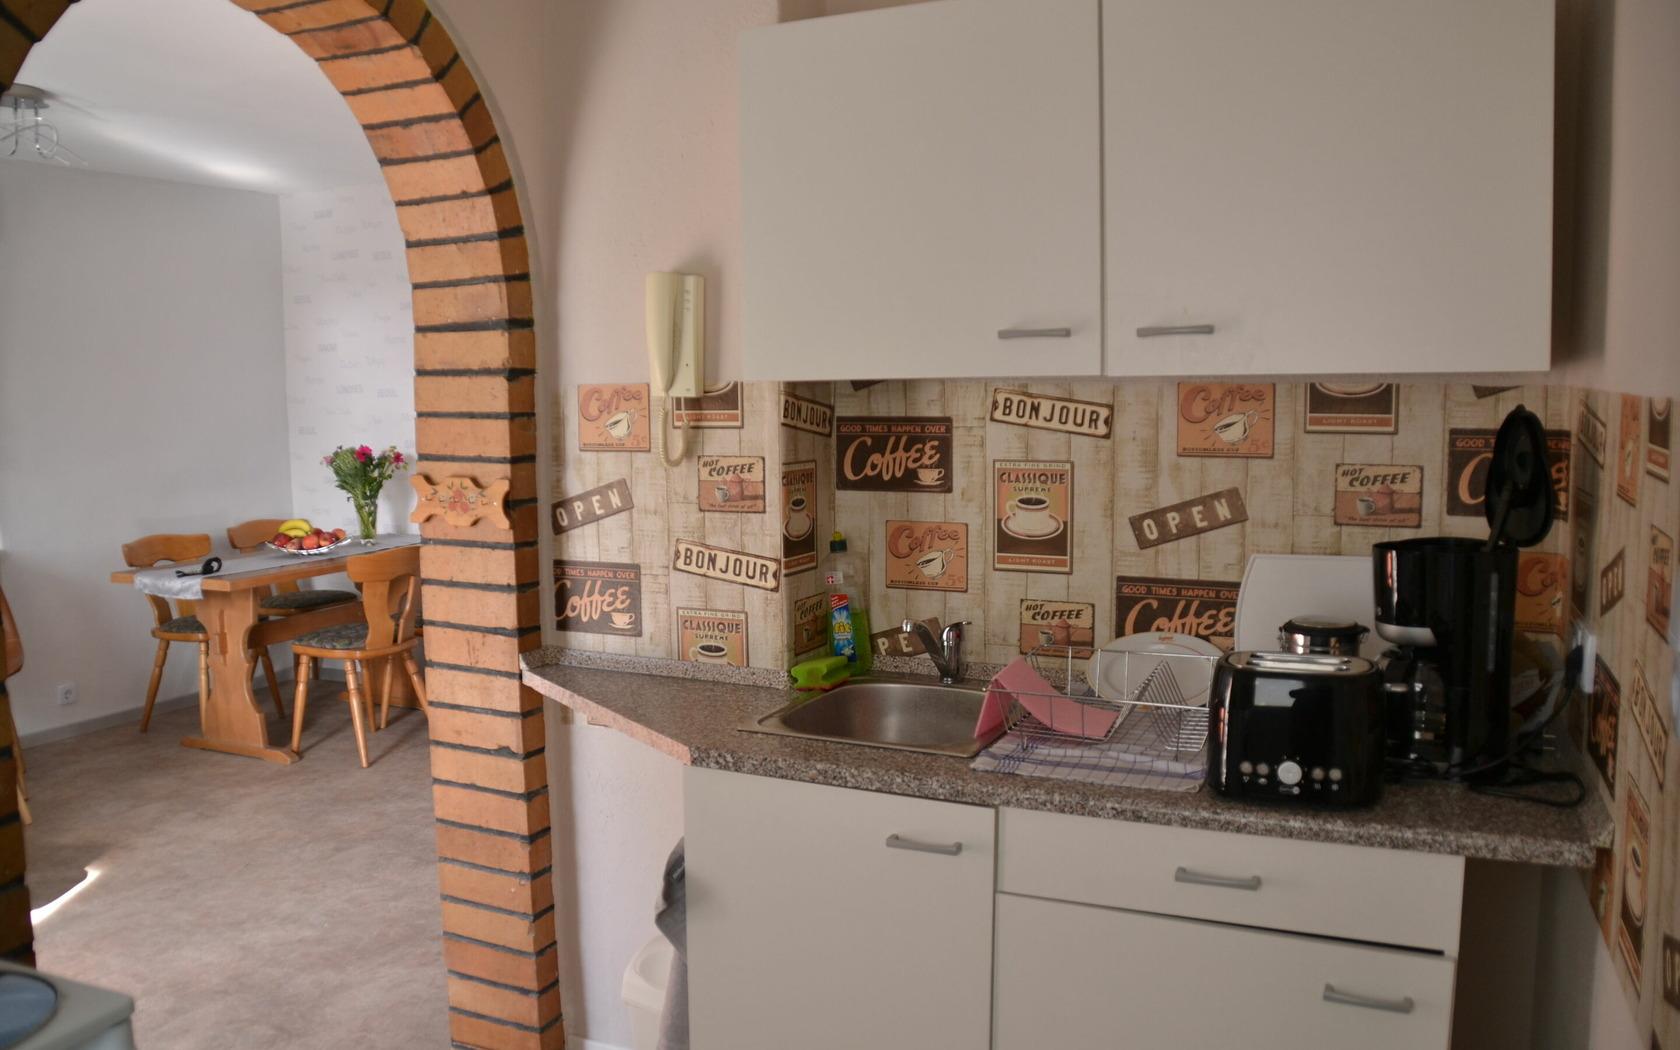 Ferienhaus Gartenidyll Kochbereich, Foto: MuT Guben